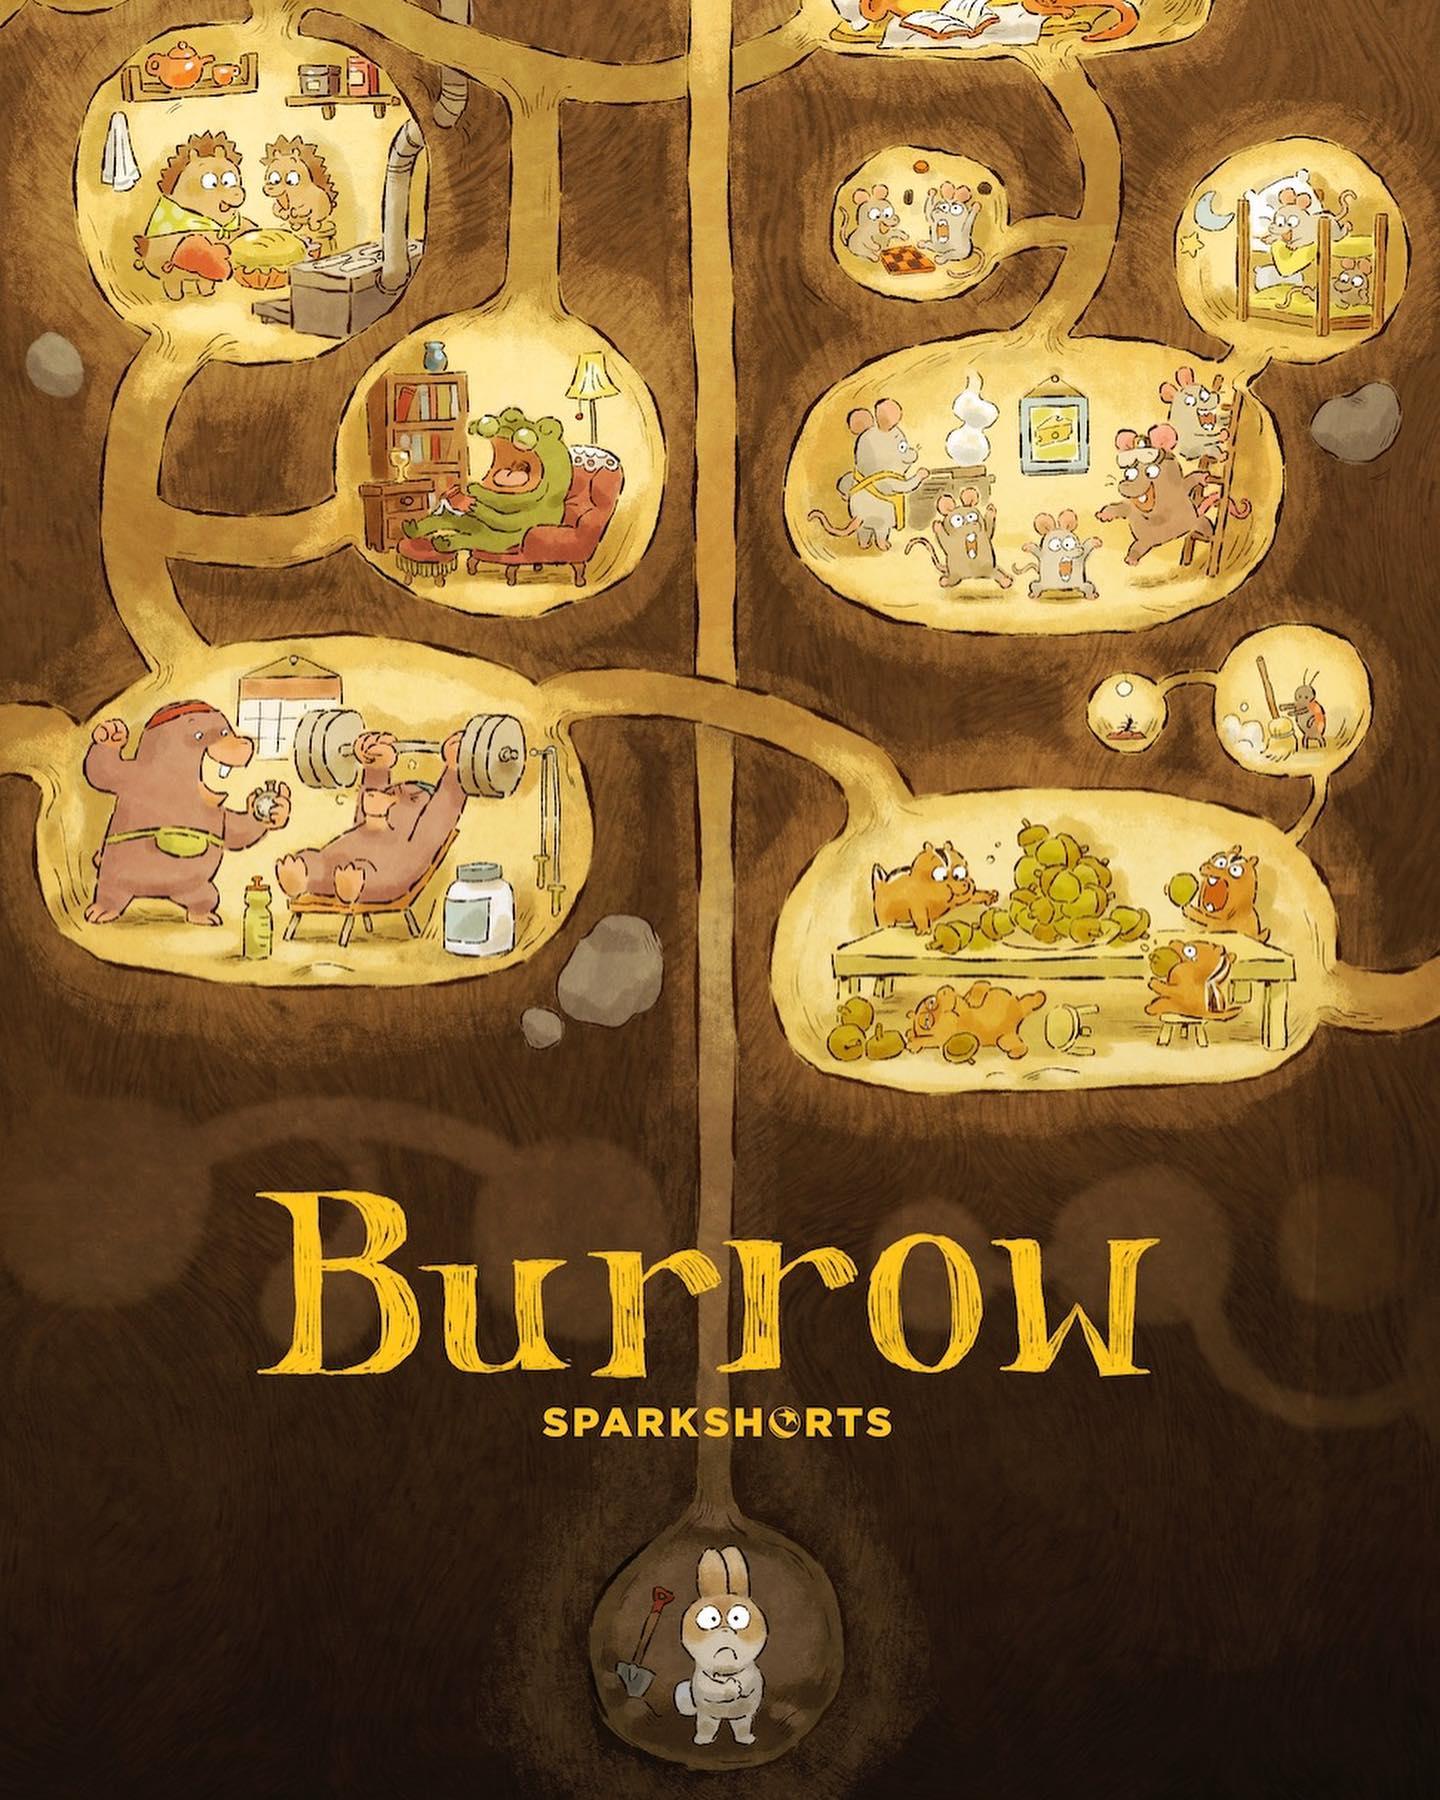 affiche poster terrier burrow disney pixar sparkshort